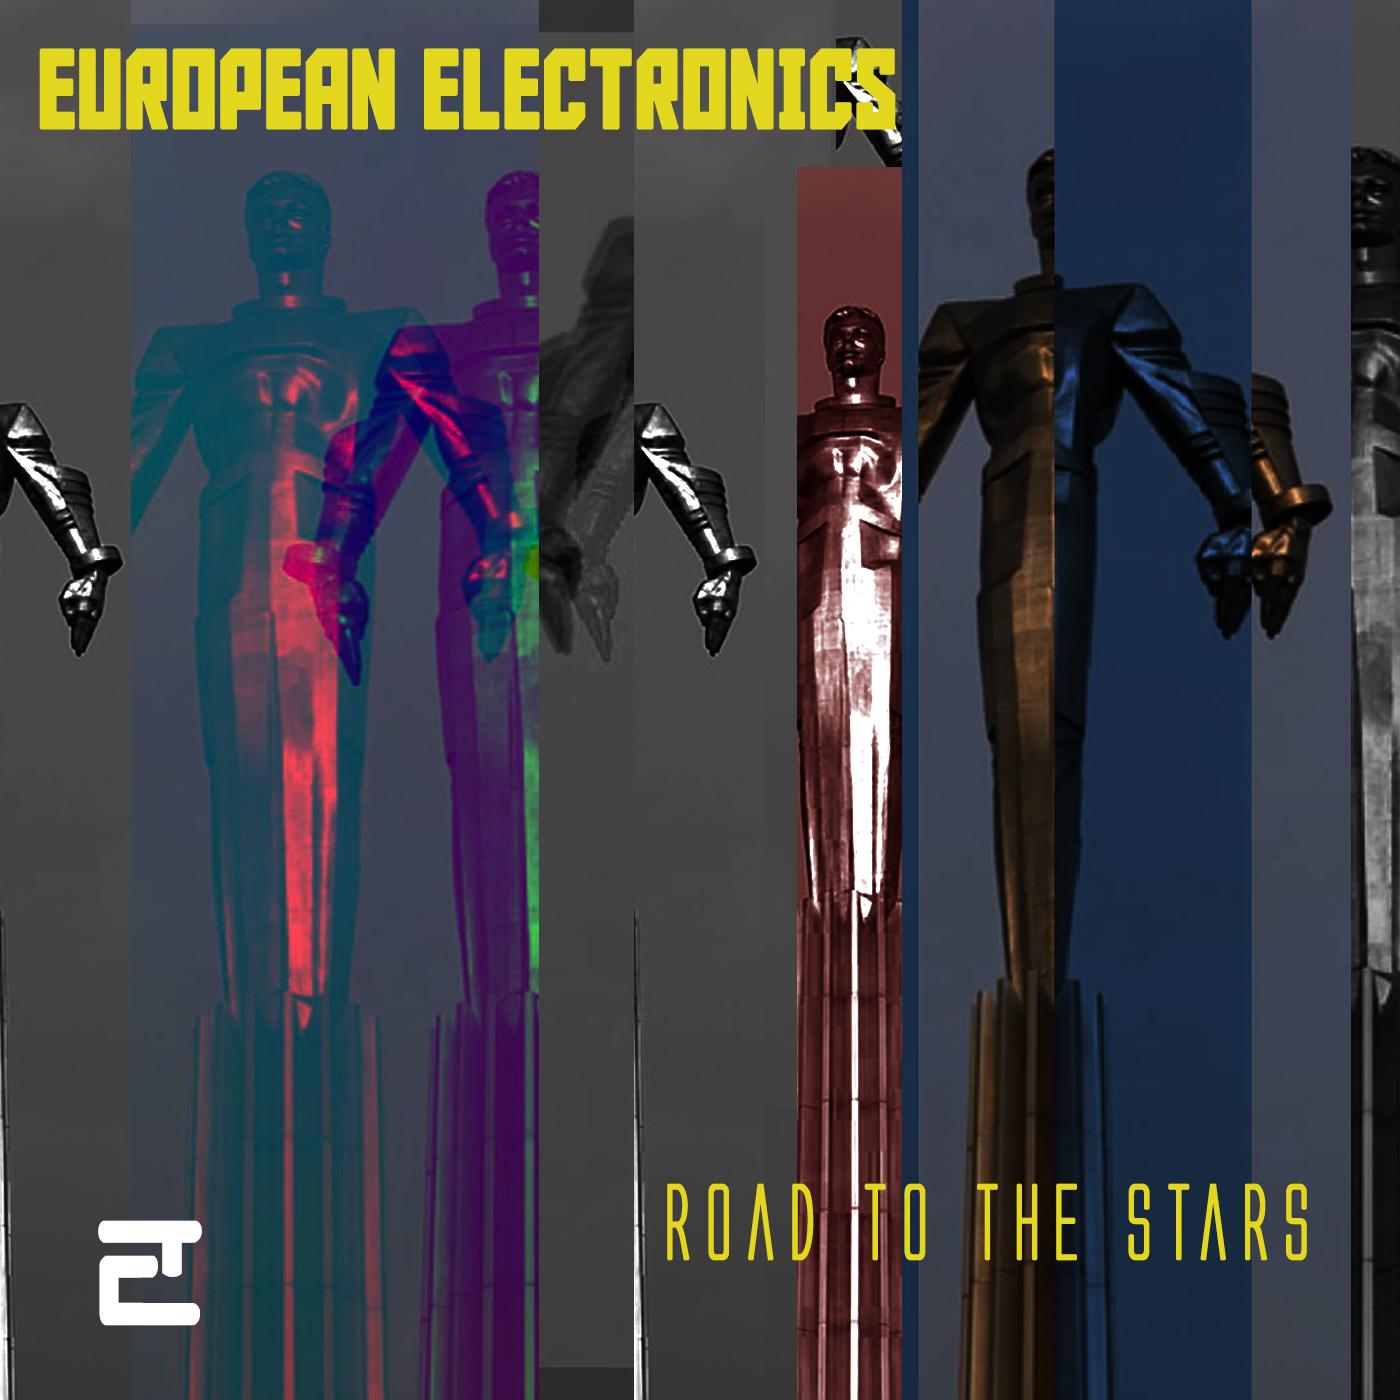 E94 European Electronics: Road to the Stars